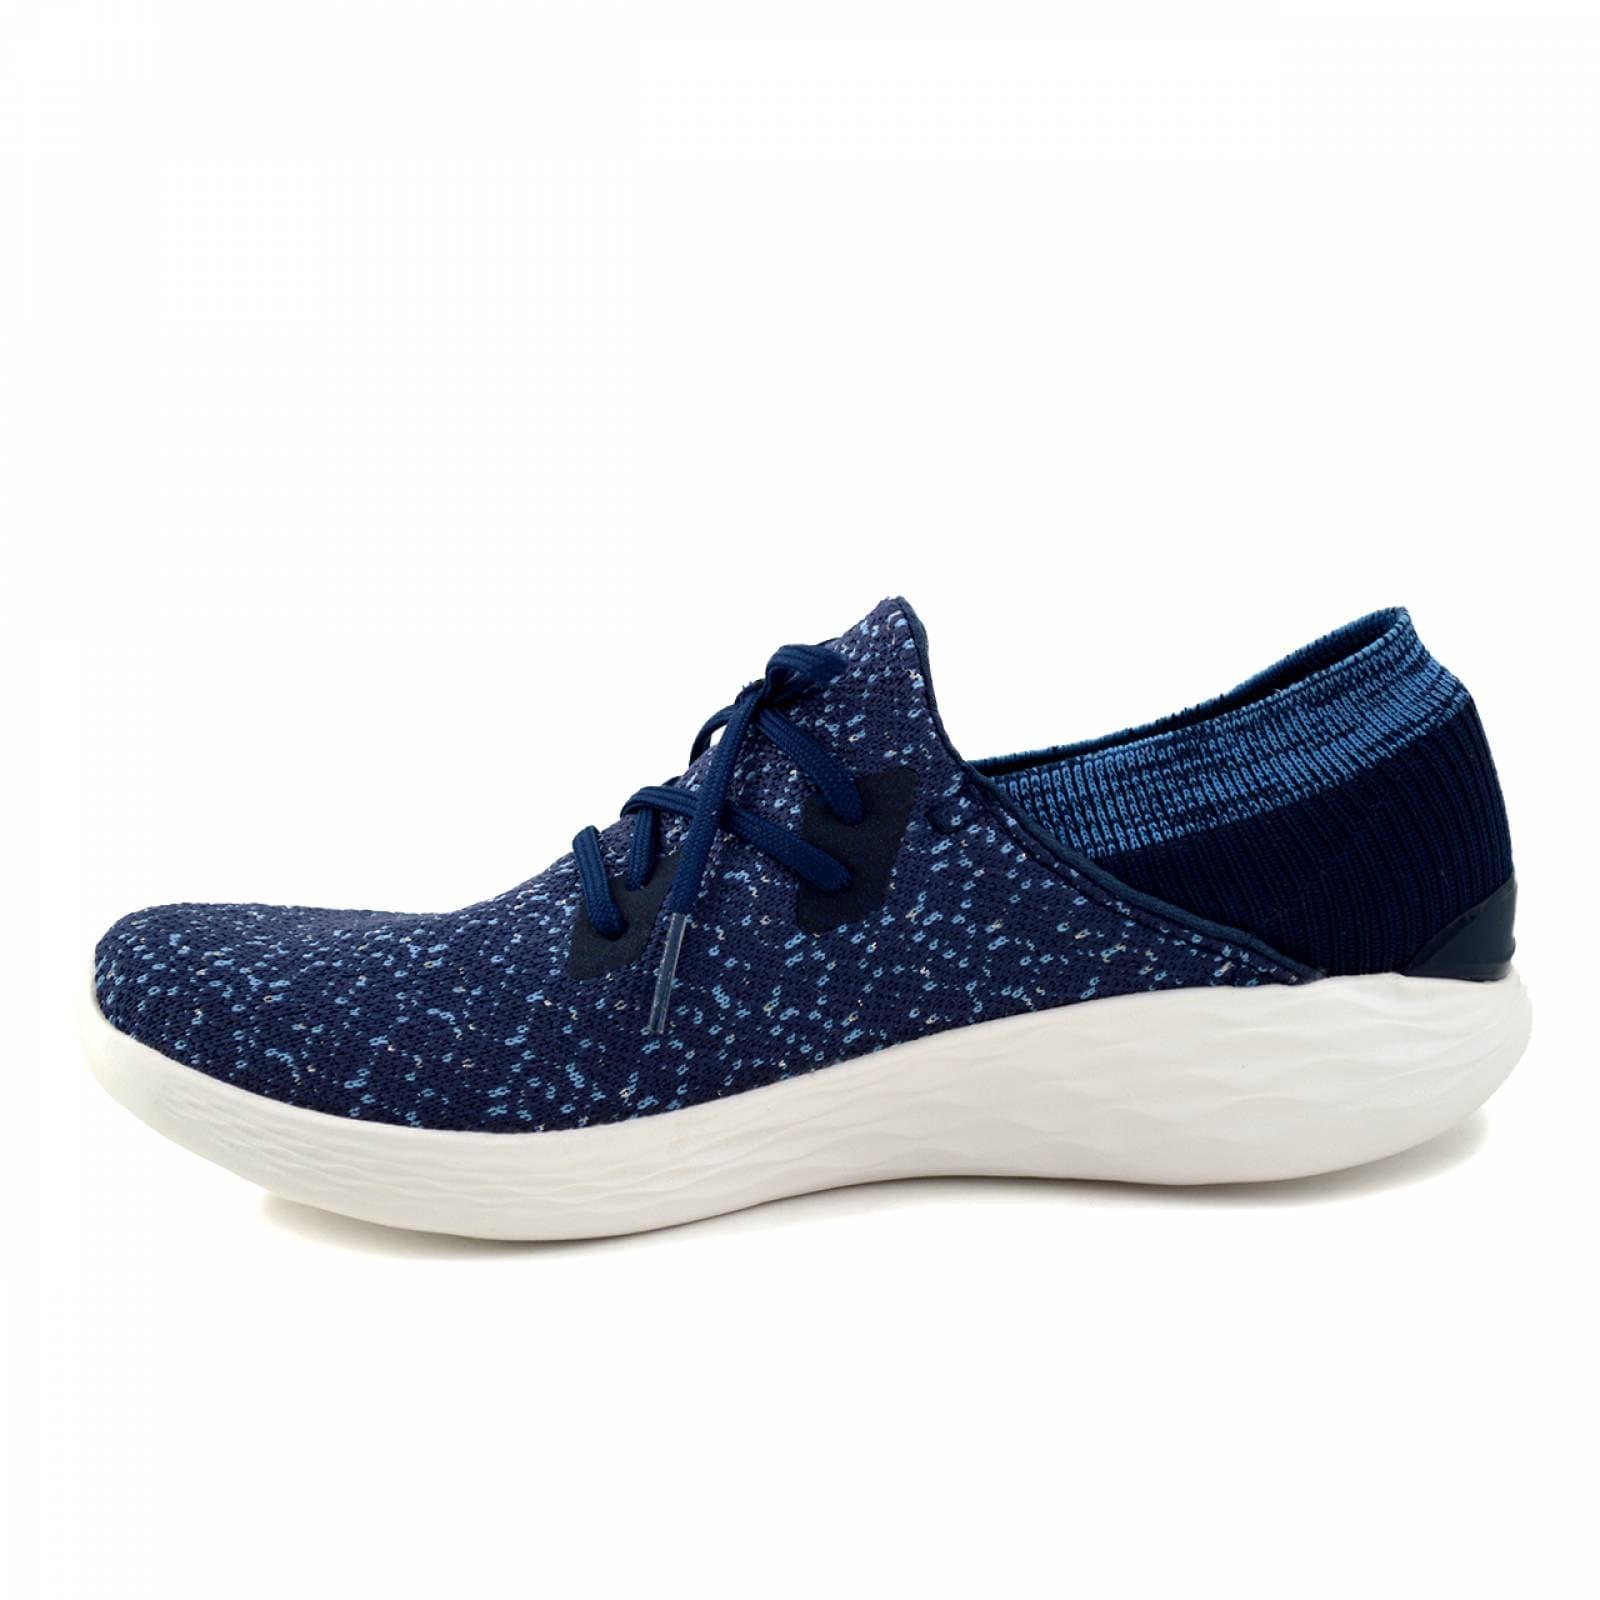 zapatos skechers para dama